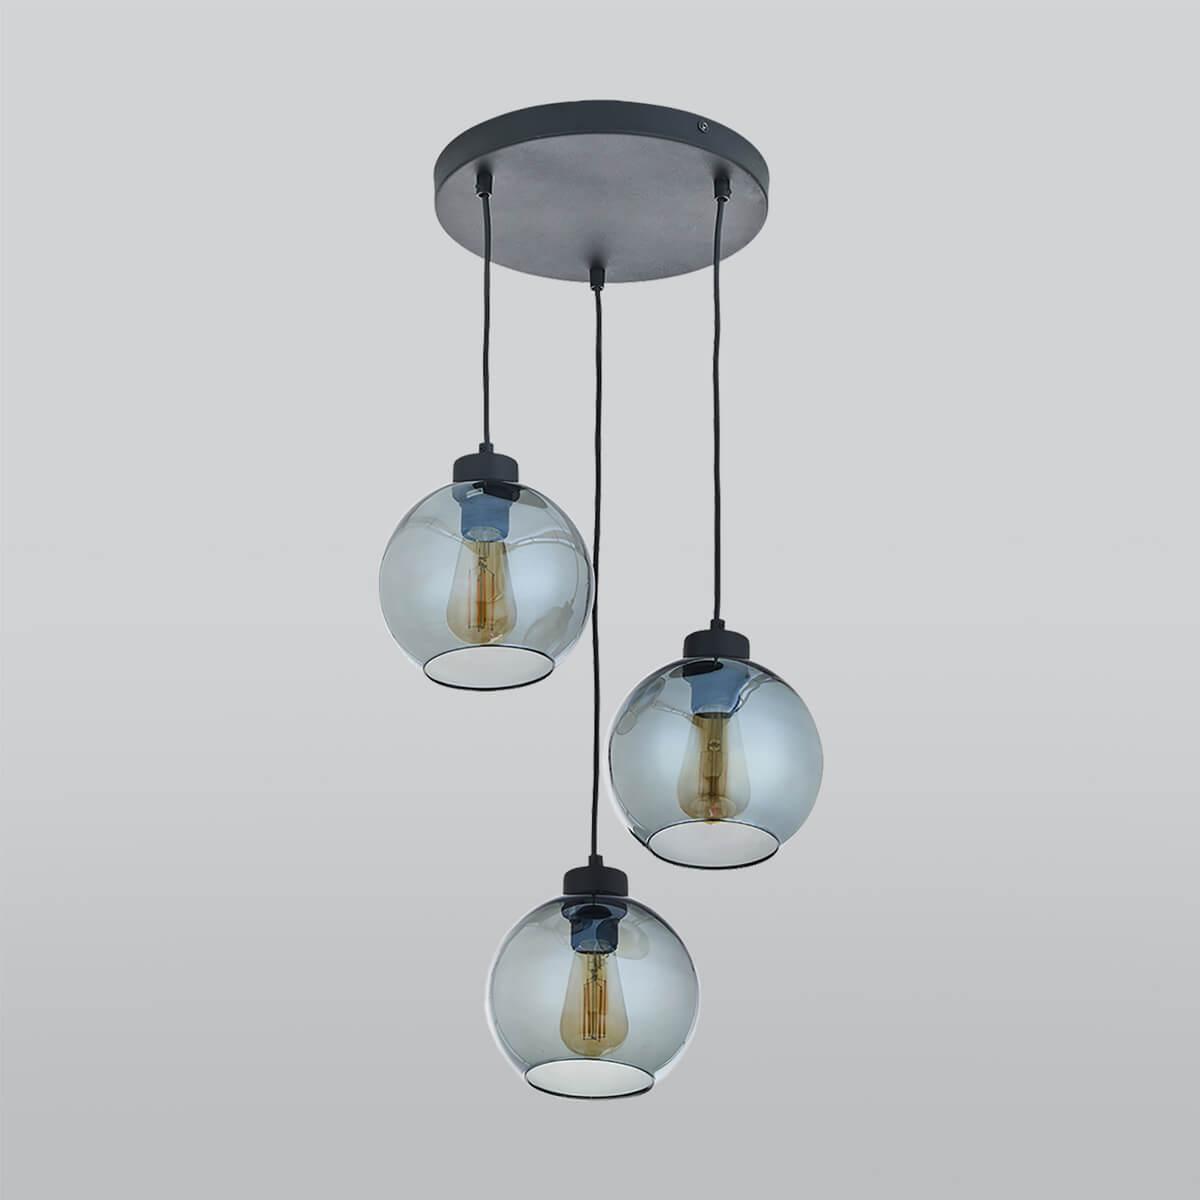 Светильник TK Lighting 2819 Cubus Graphite